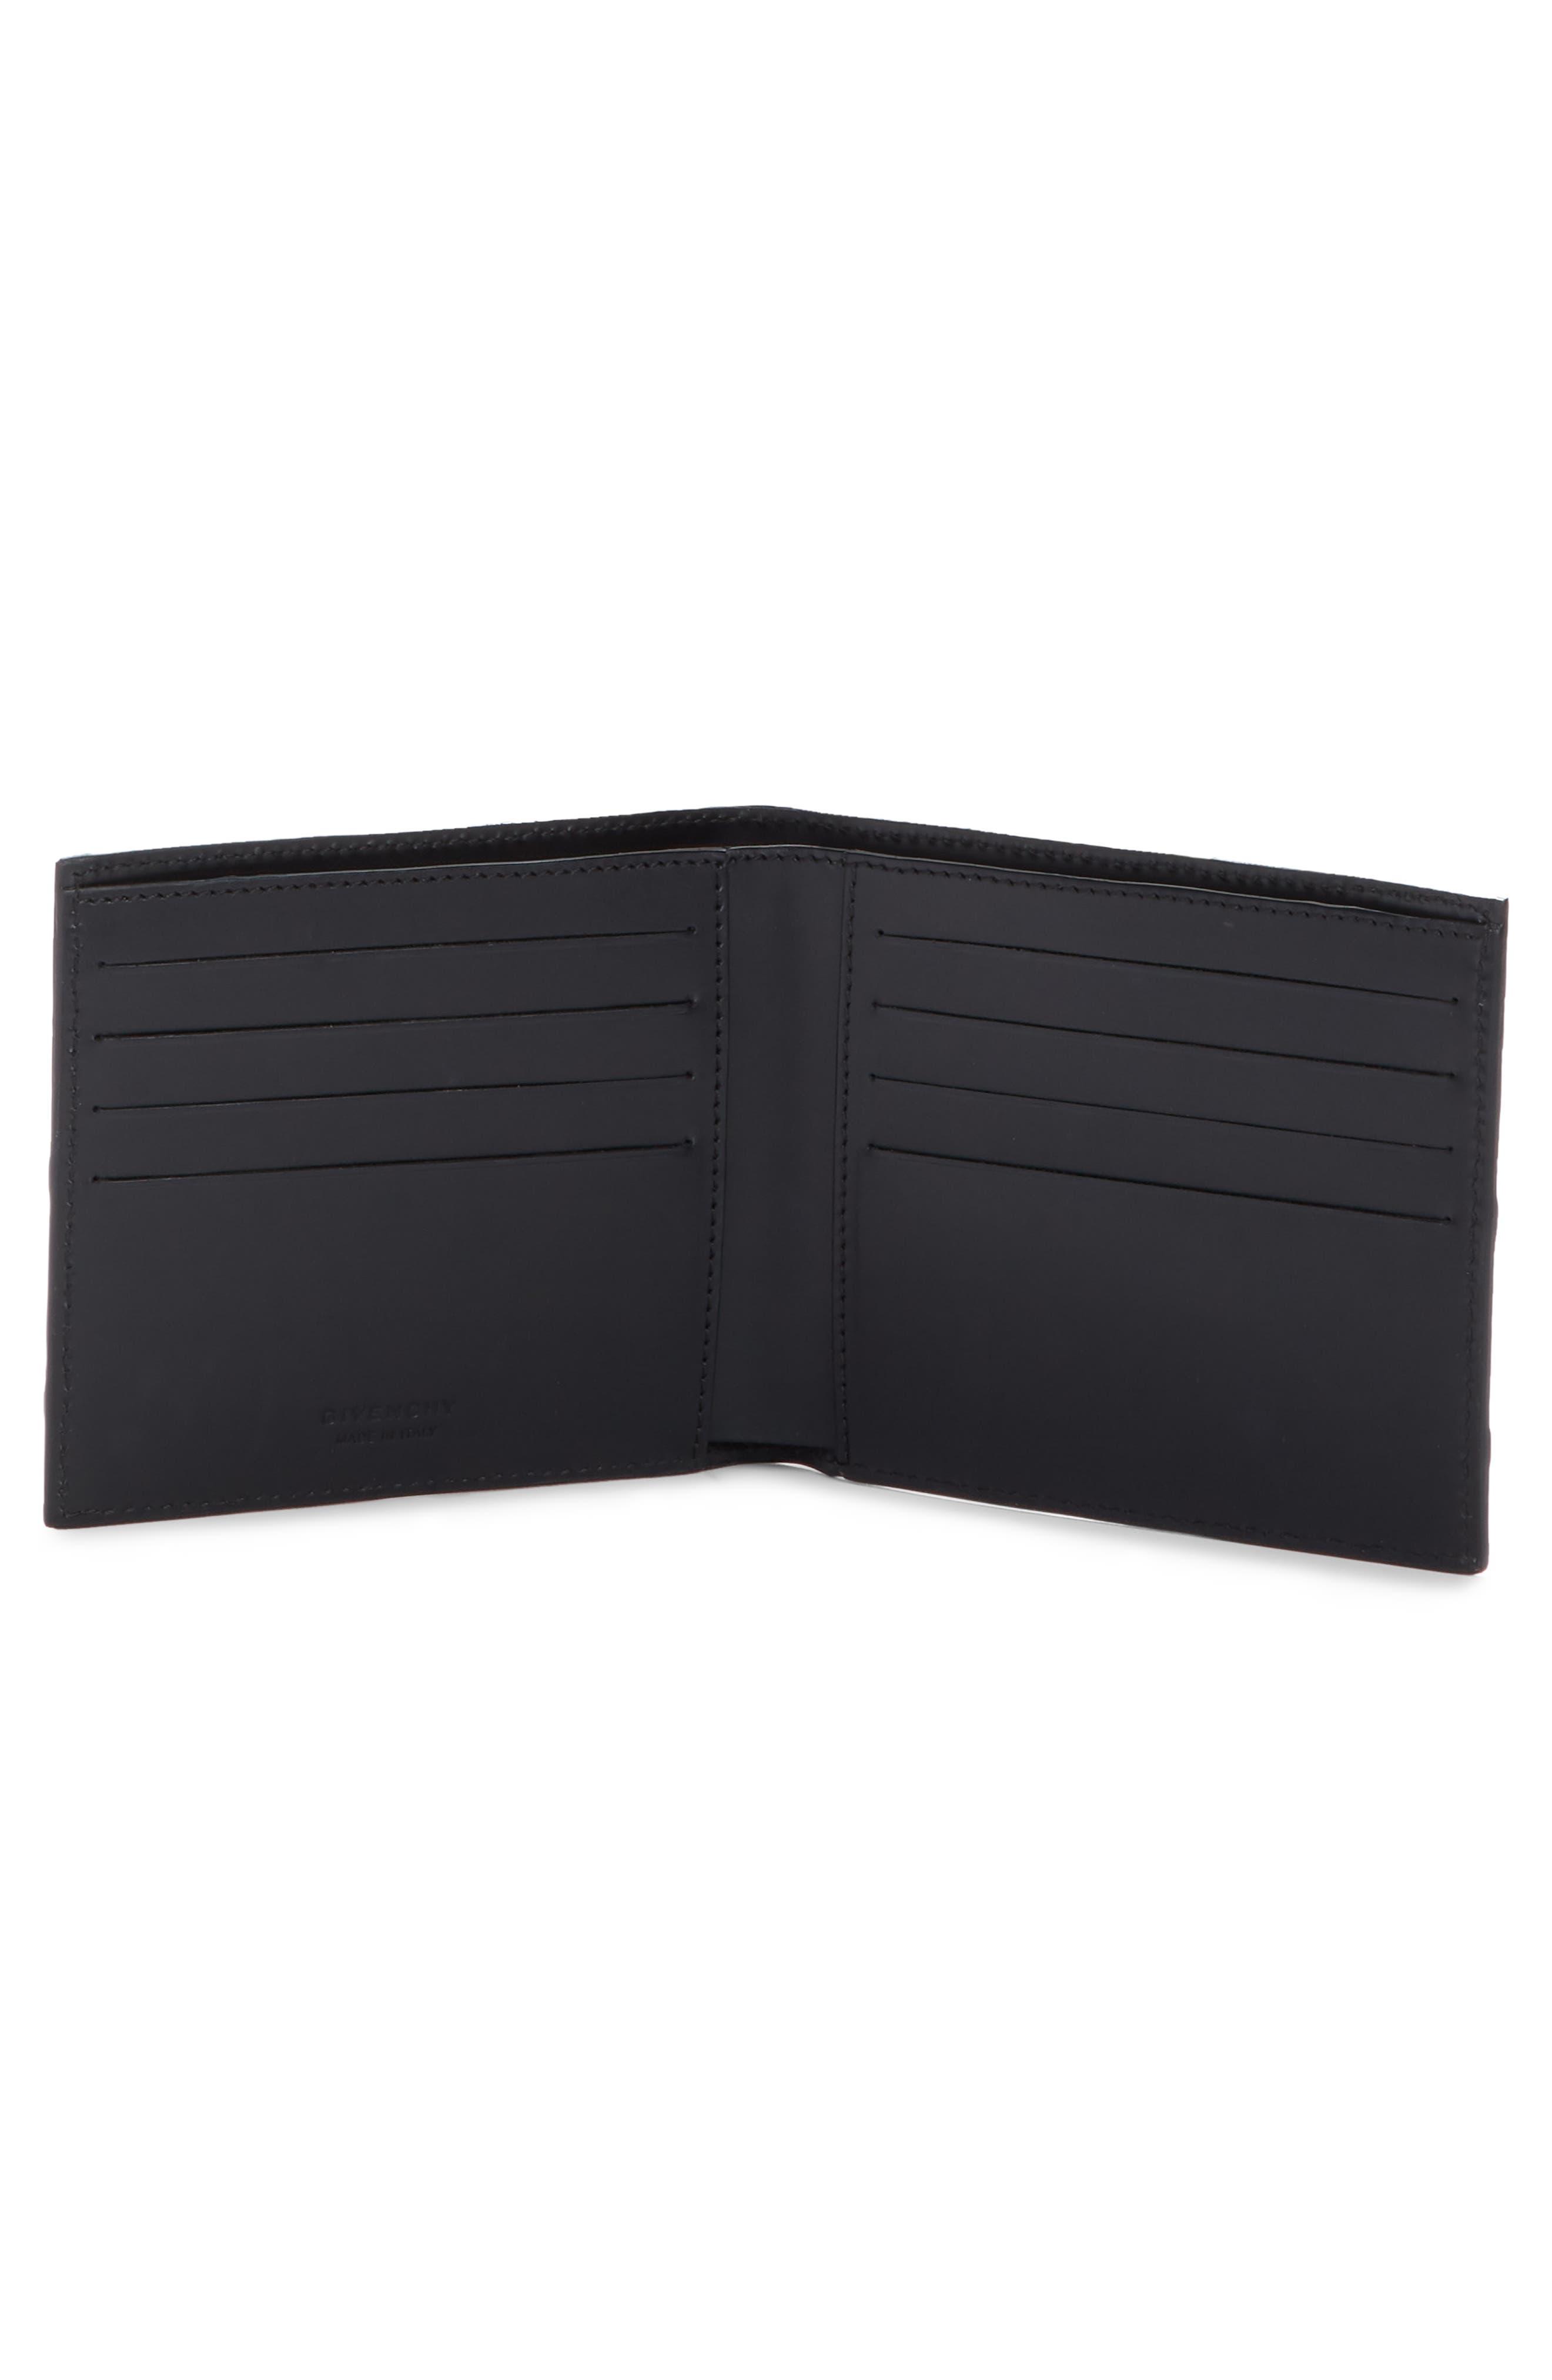 GIVENCHY,                             Logo Calfskin Leather Wallet,                             Alternate thumbnail 2, color,                             BLACK